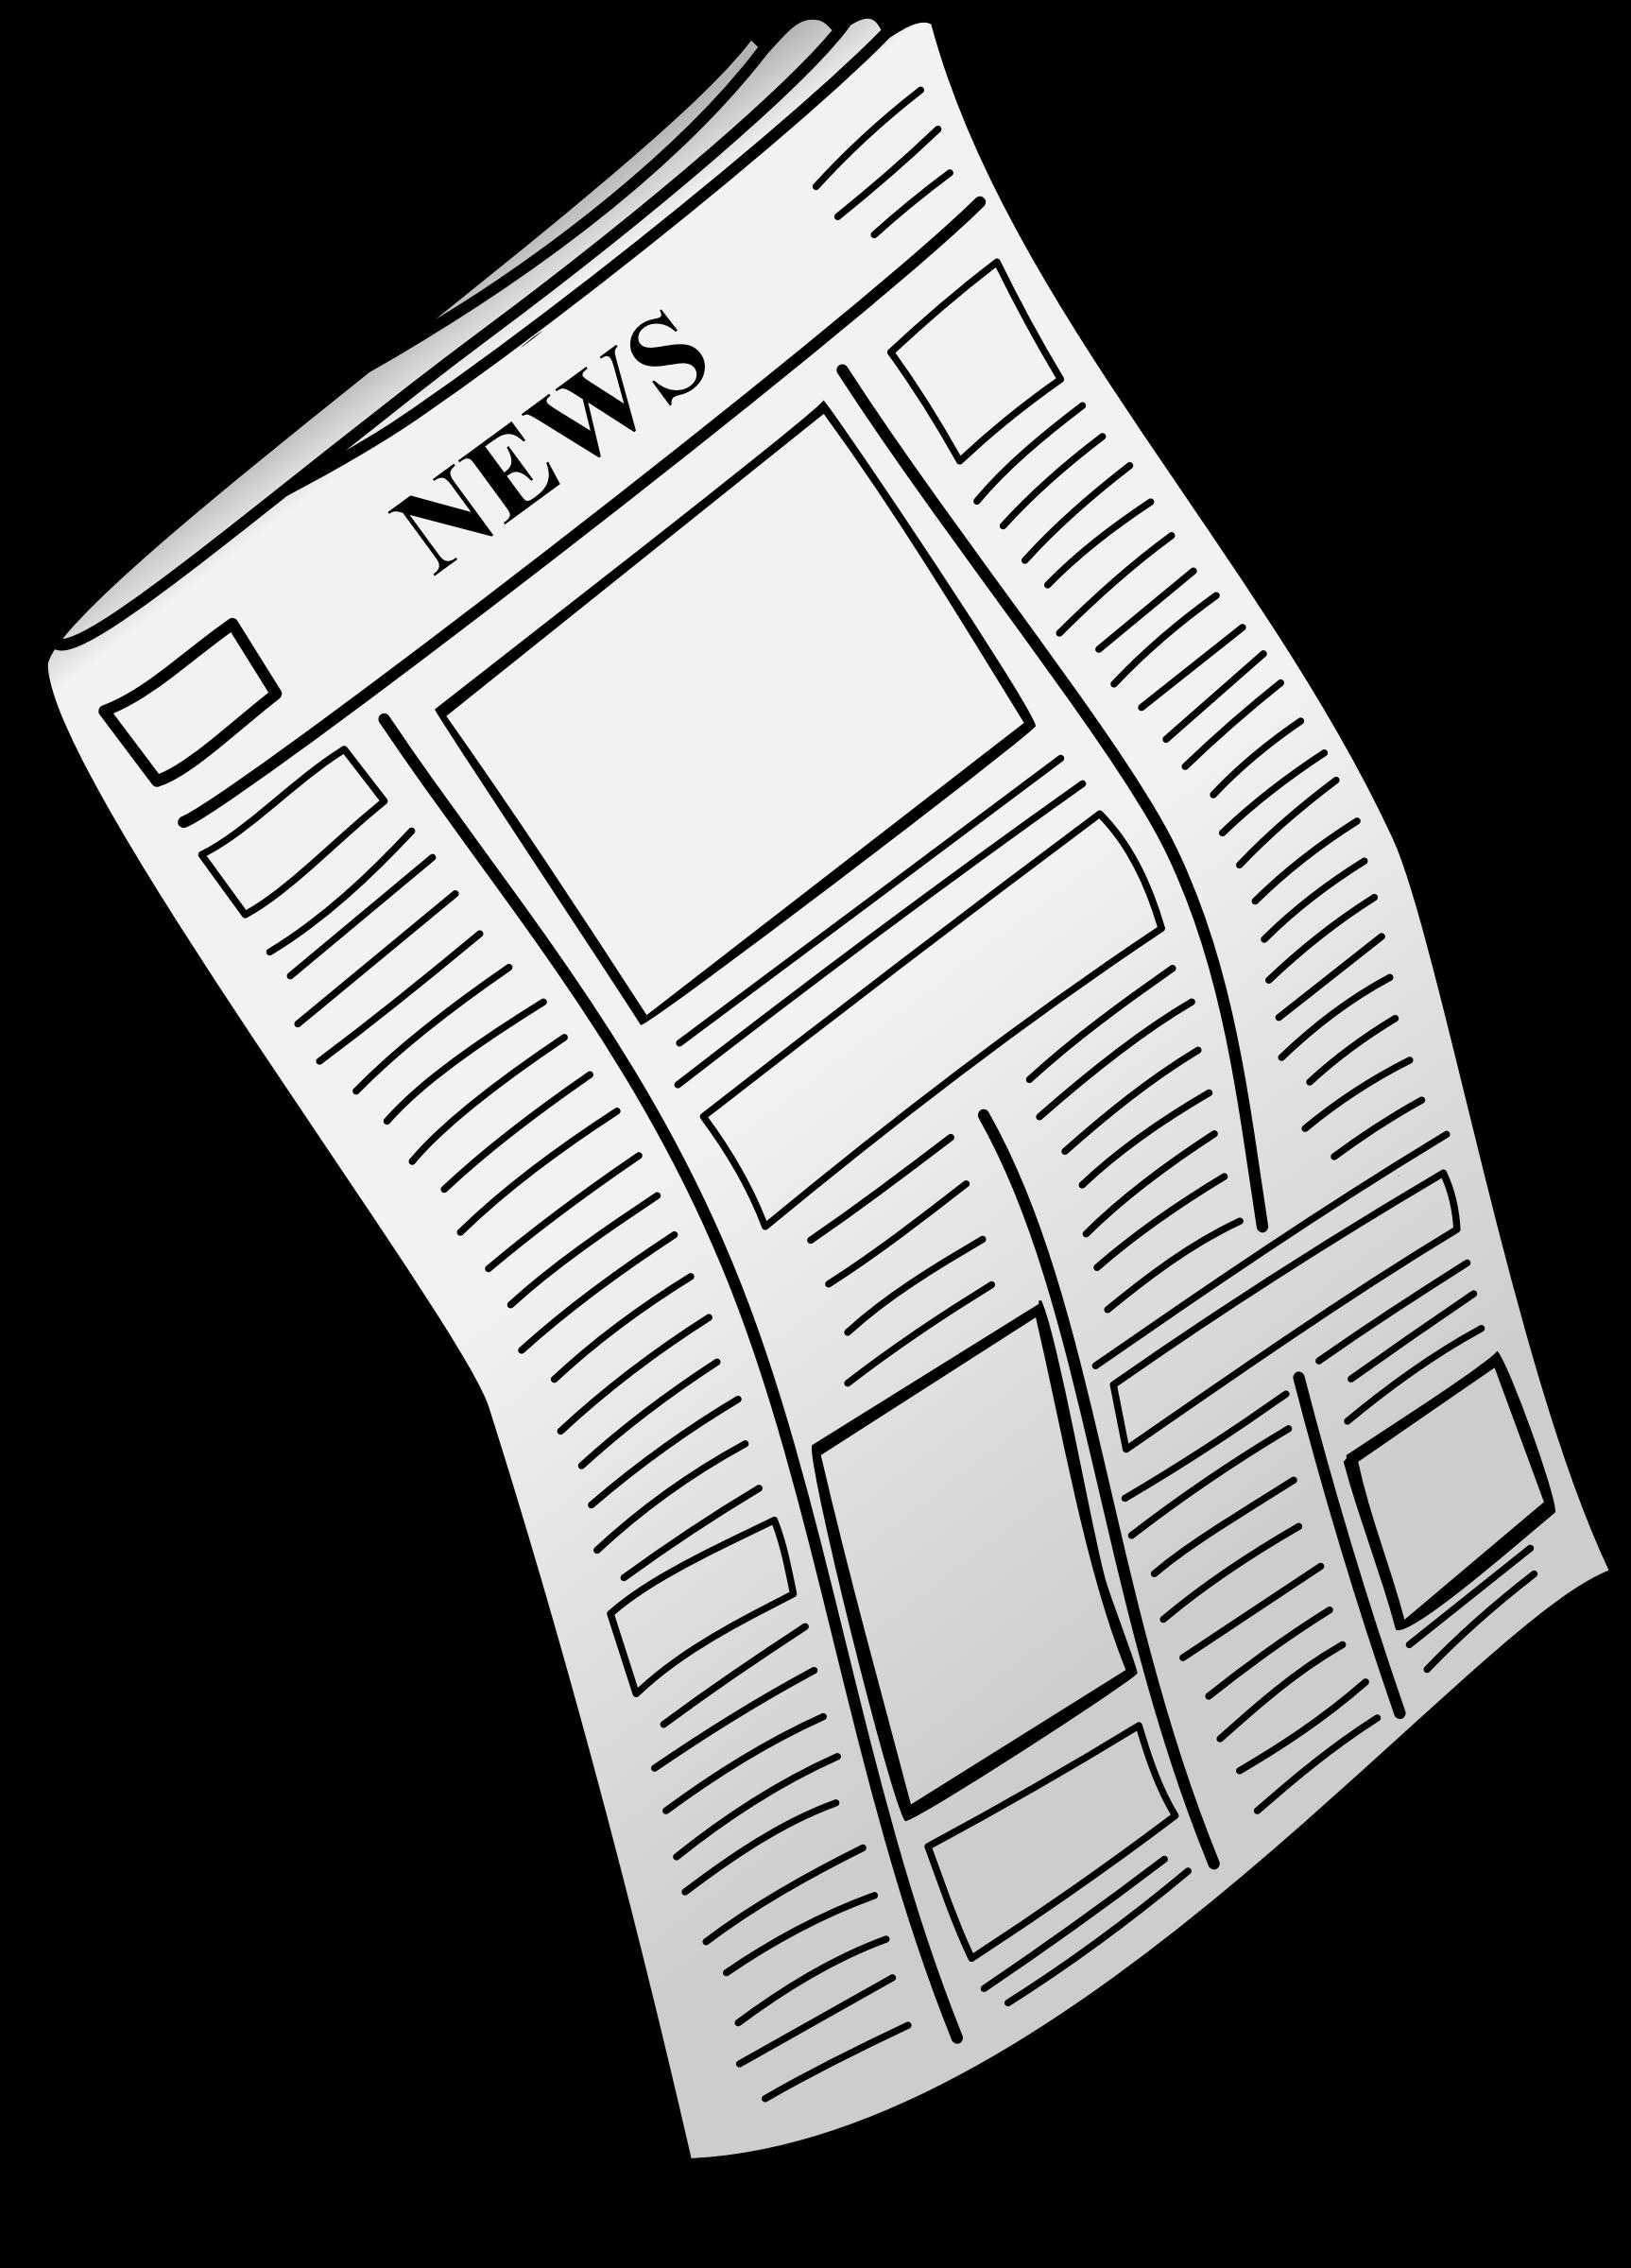 Clipart newspaper - Presse papier open office ...